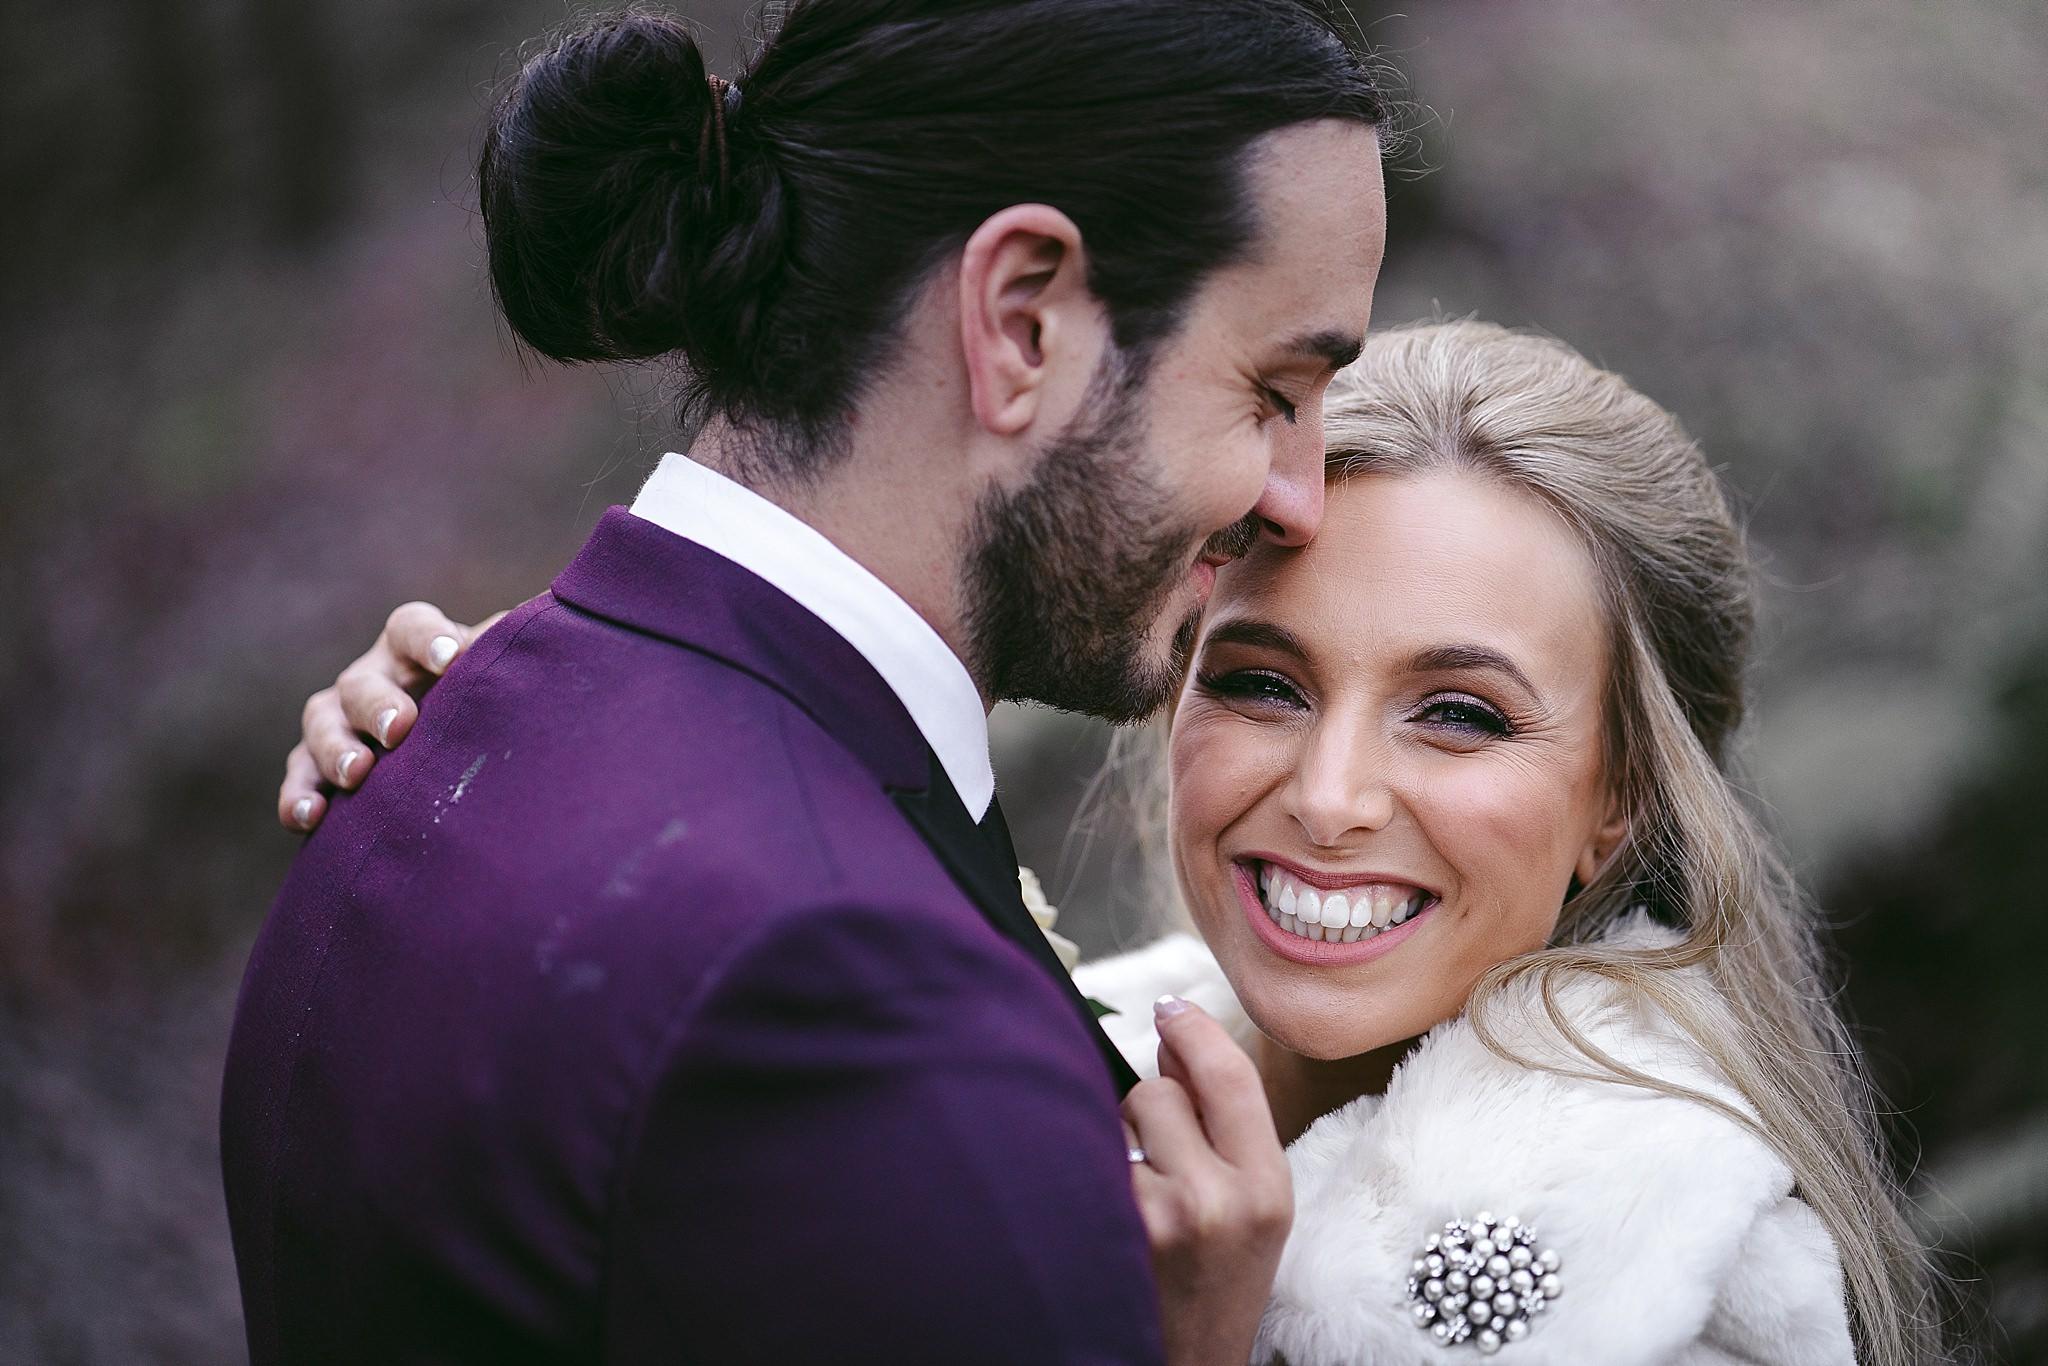 aga-tomaszek-wedding-photographer-cardiff-2016_1031